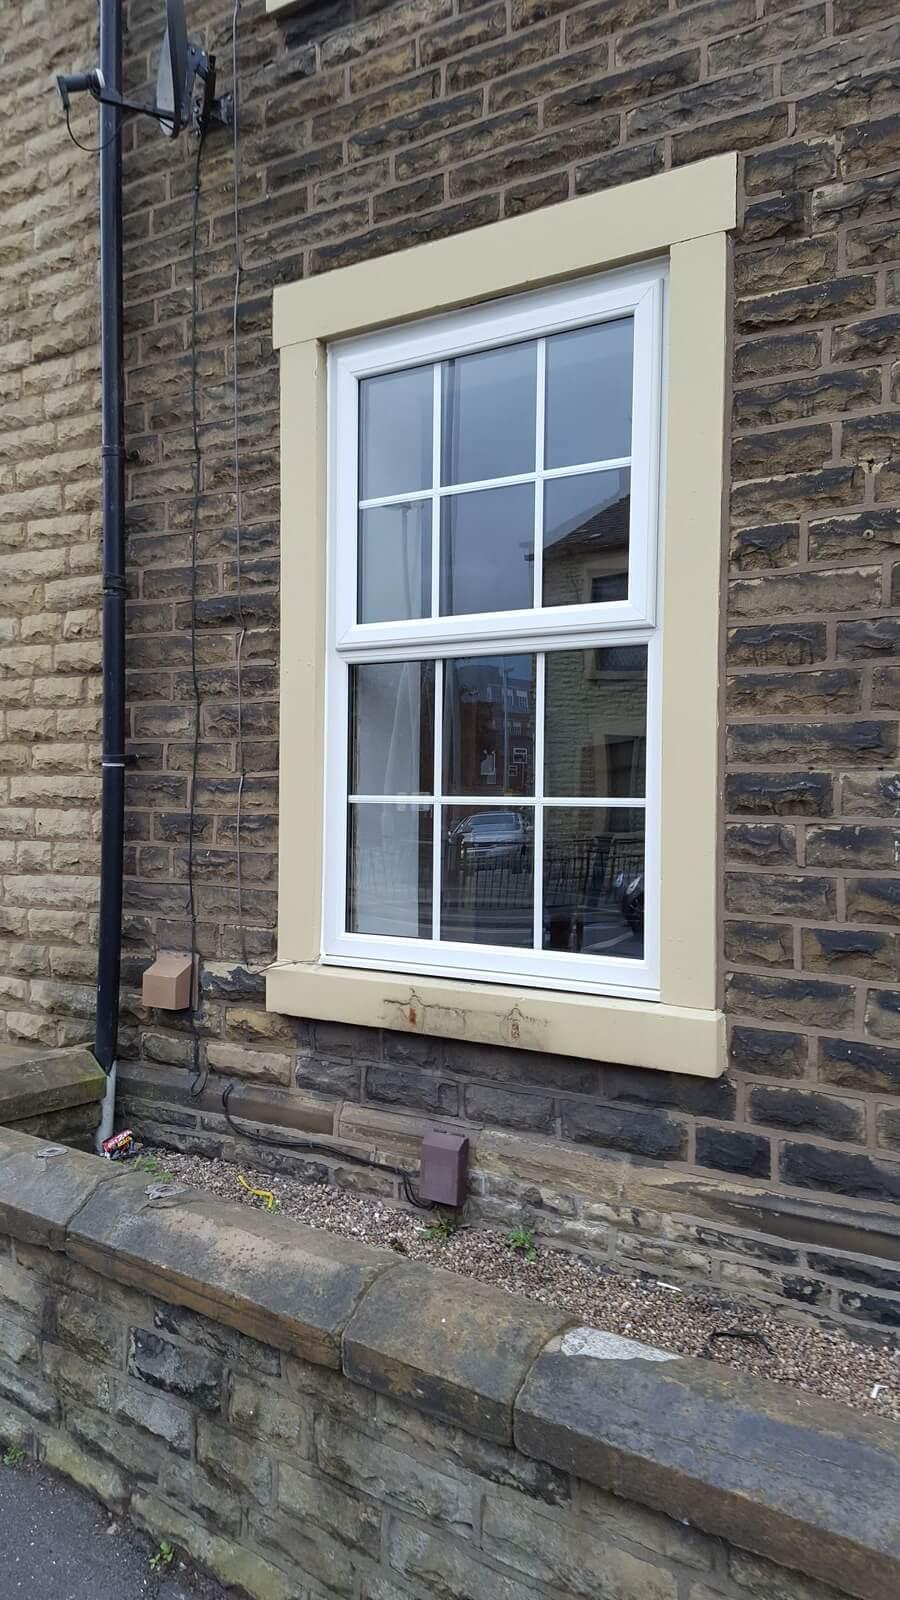 close up on brick house window